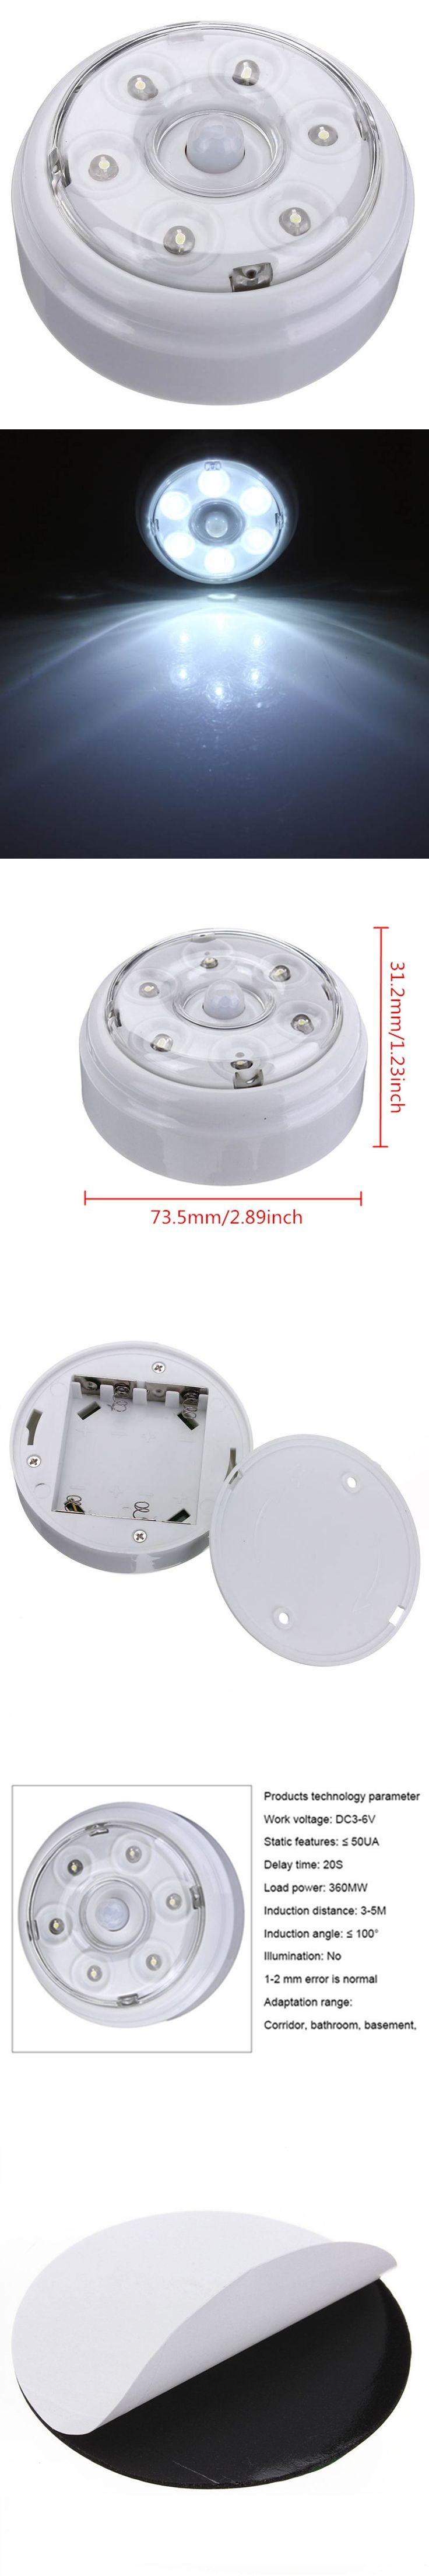 DC3-6V 6 LED Wireless Infrared PIR Auto Sensor Motion Detector Battery Powered Door Wall Light Lamp